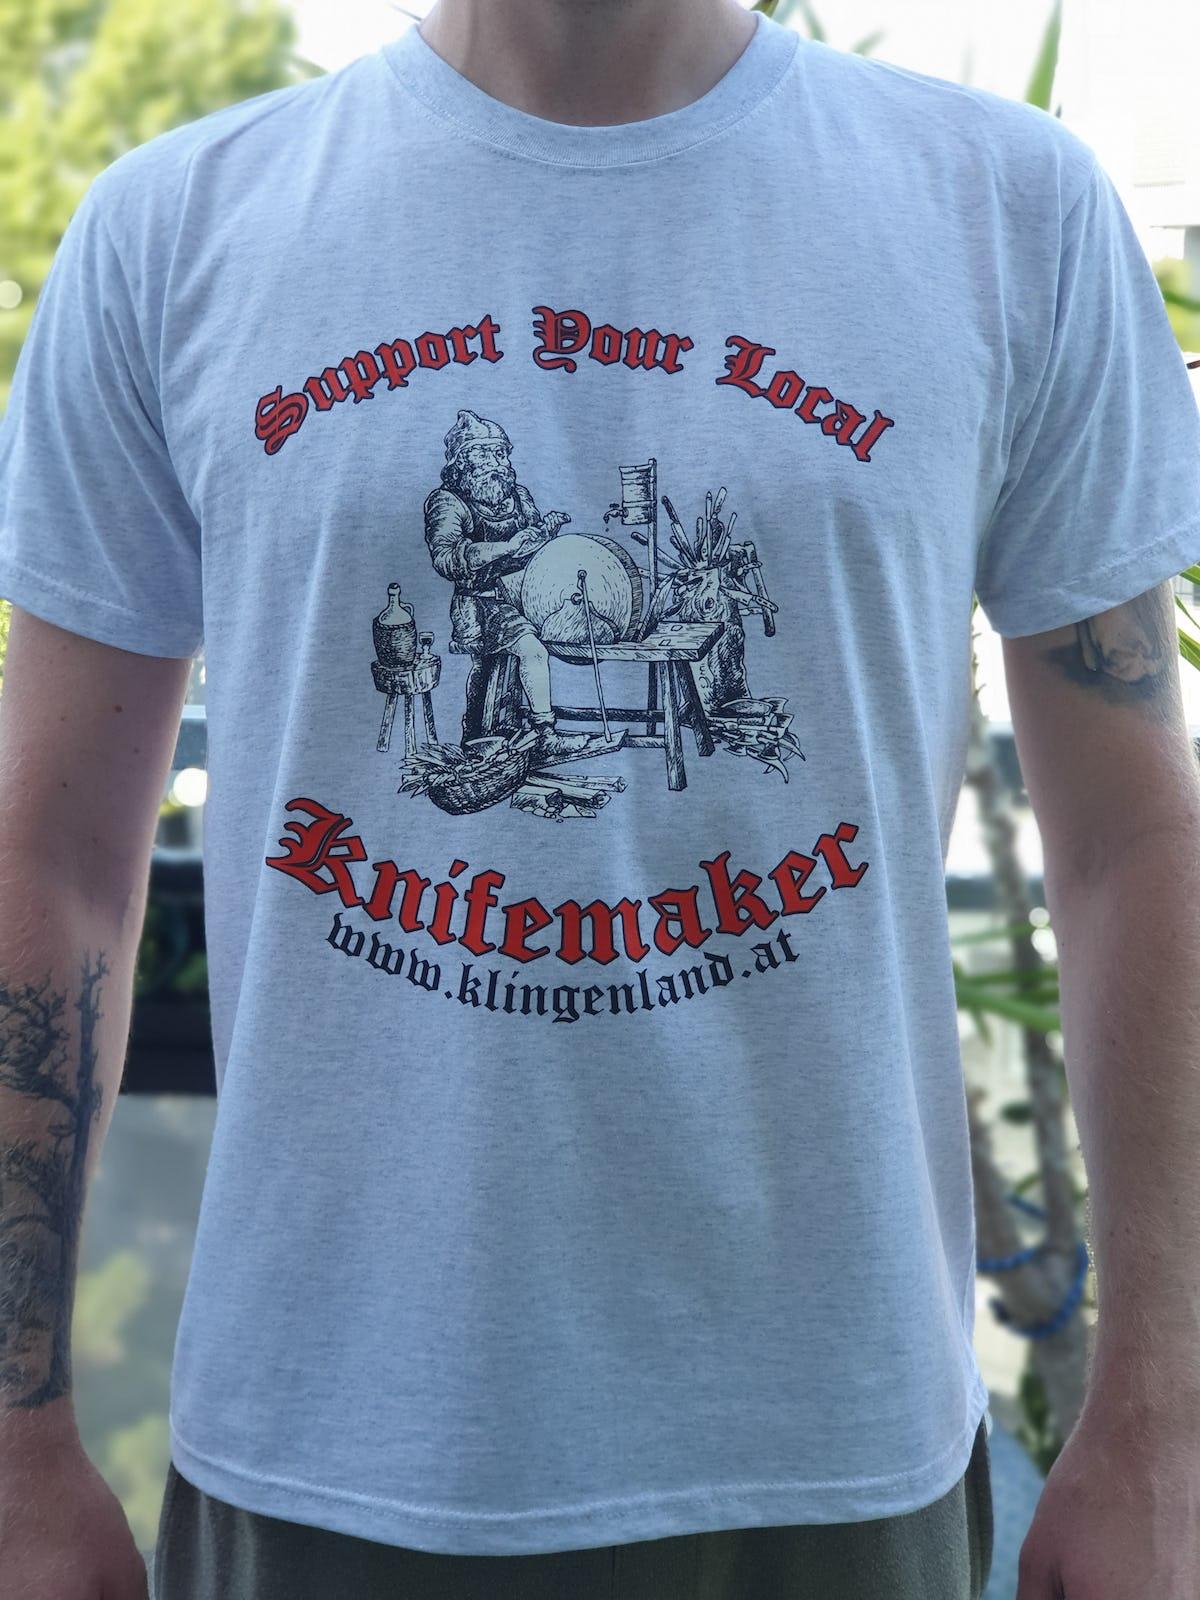 Klingenland T-Shirts